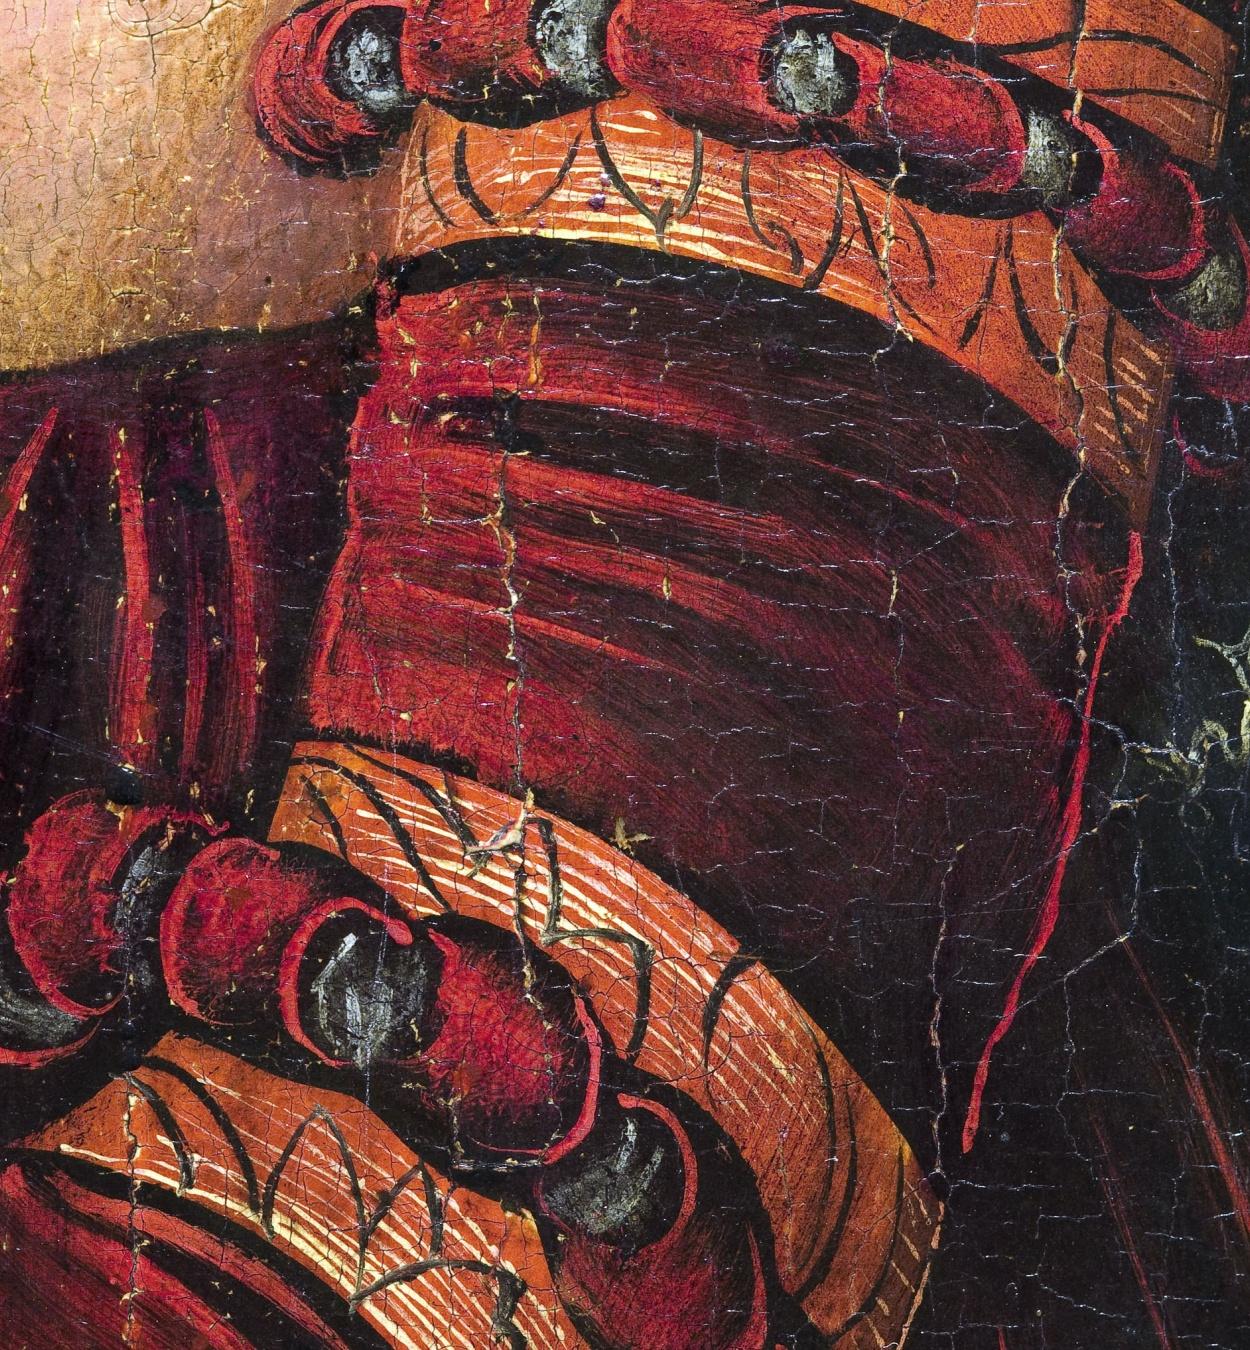 Lucas Cranach (el Vell) - Parella amorosa desigual - 1517 [1]